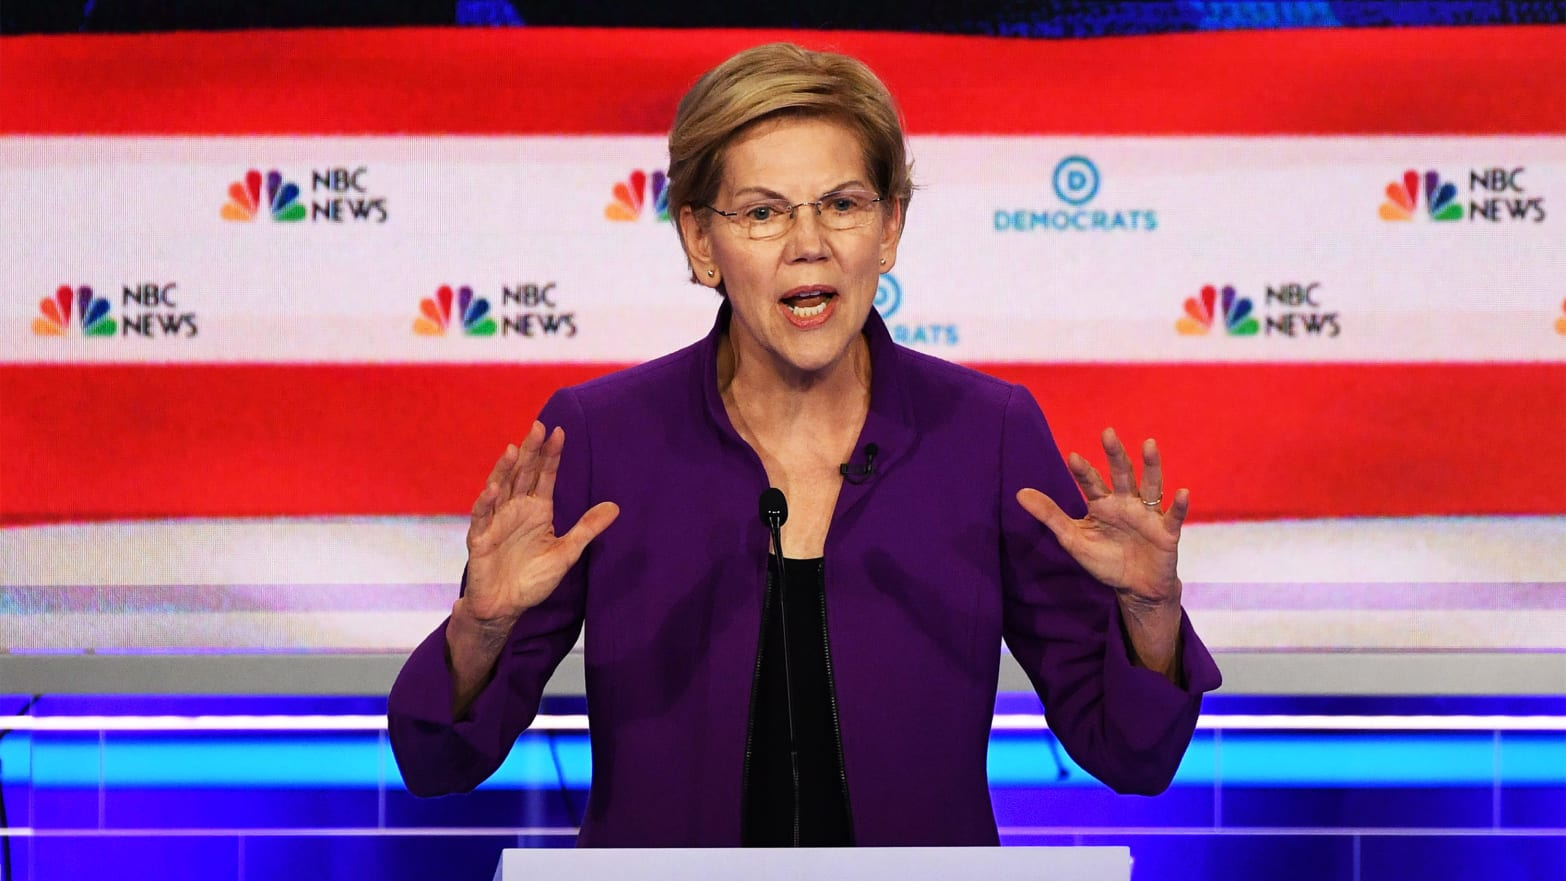 2020 Democratic Debates: First Night Begins With All Eyes on Sen. Elizabeth Warren